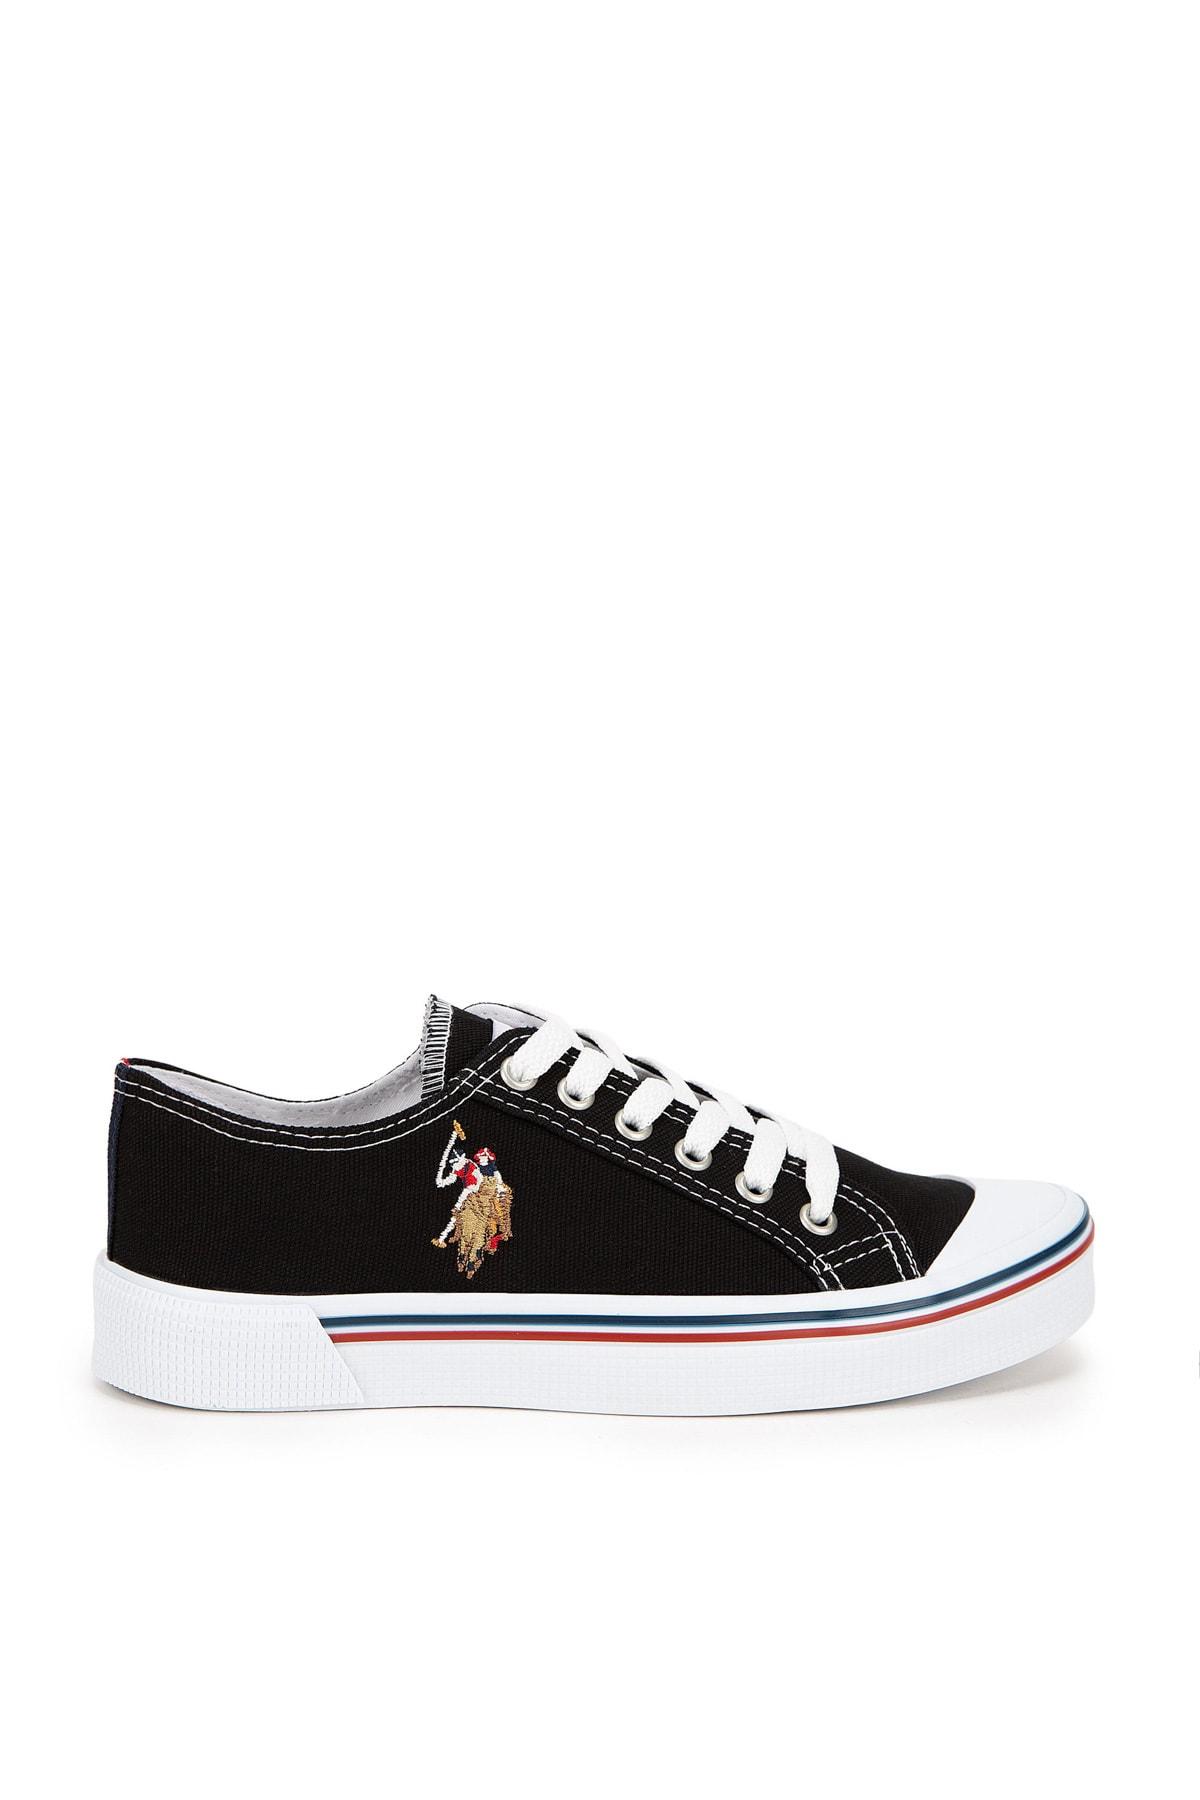 U.S. Polo Assn. Erkek Sneaker S081SZ033.000.1027729 1